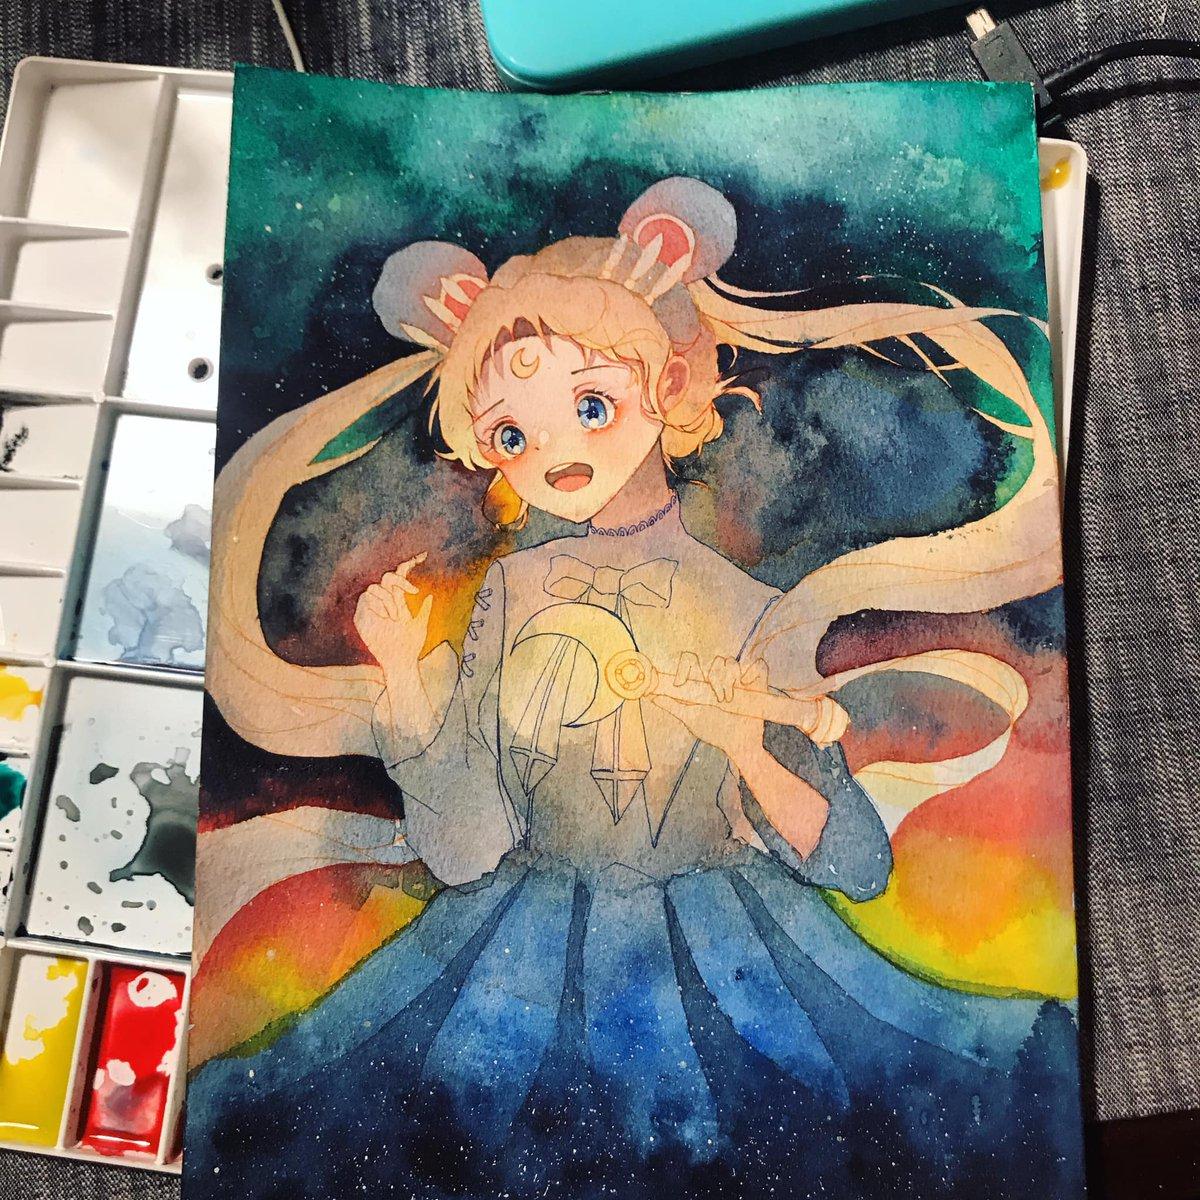 #anime #drawing #art #artist #artwork #artistsoninstagram #animeart #animegirl #fanart #fanartanime #watercolor #animedoodle #mangasketch #mangaartist #animeartwork #animestyle #costumedesigner #animeart #mangaartwork  #characterart #WHYRUep10pic.twitter.com/xRglAdTS4g